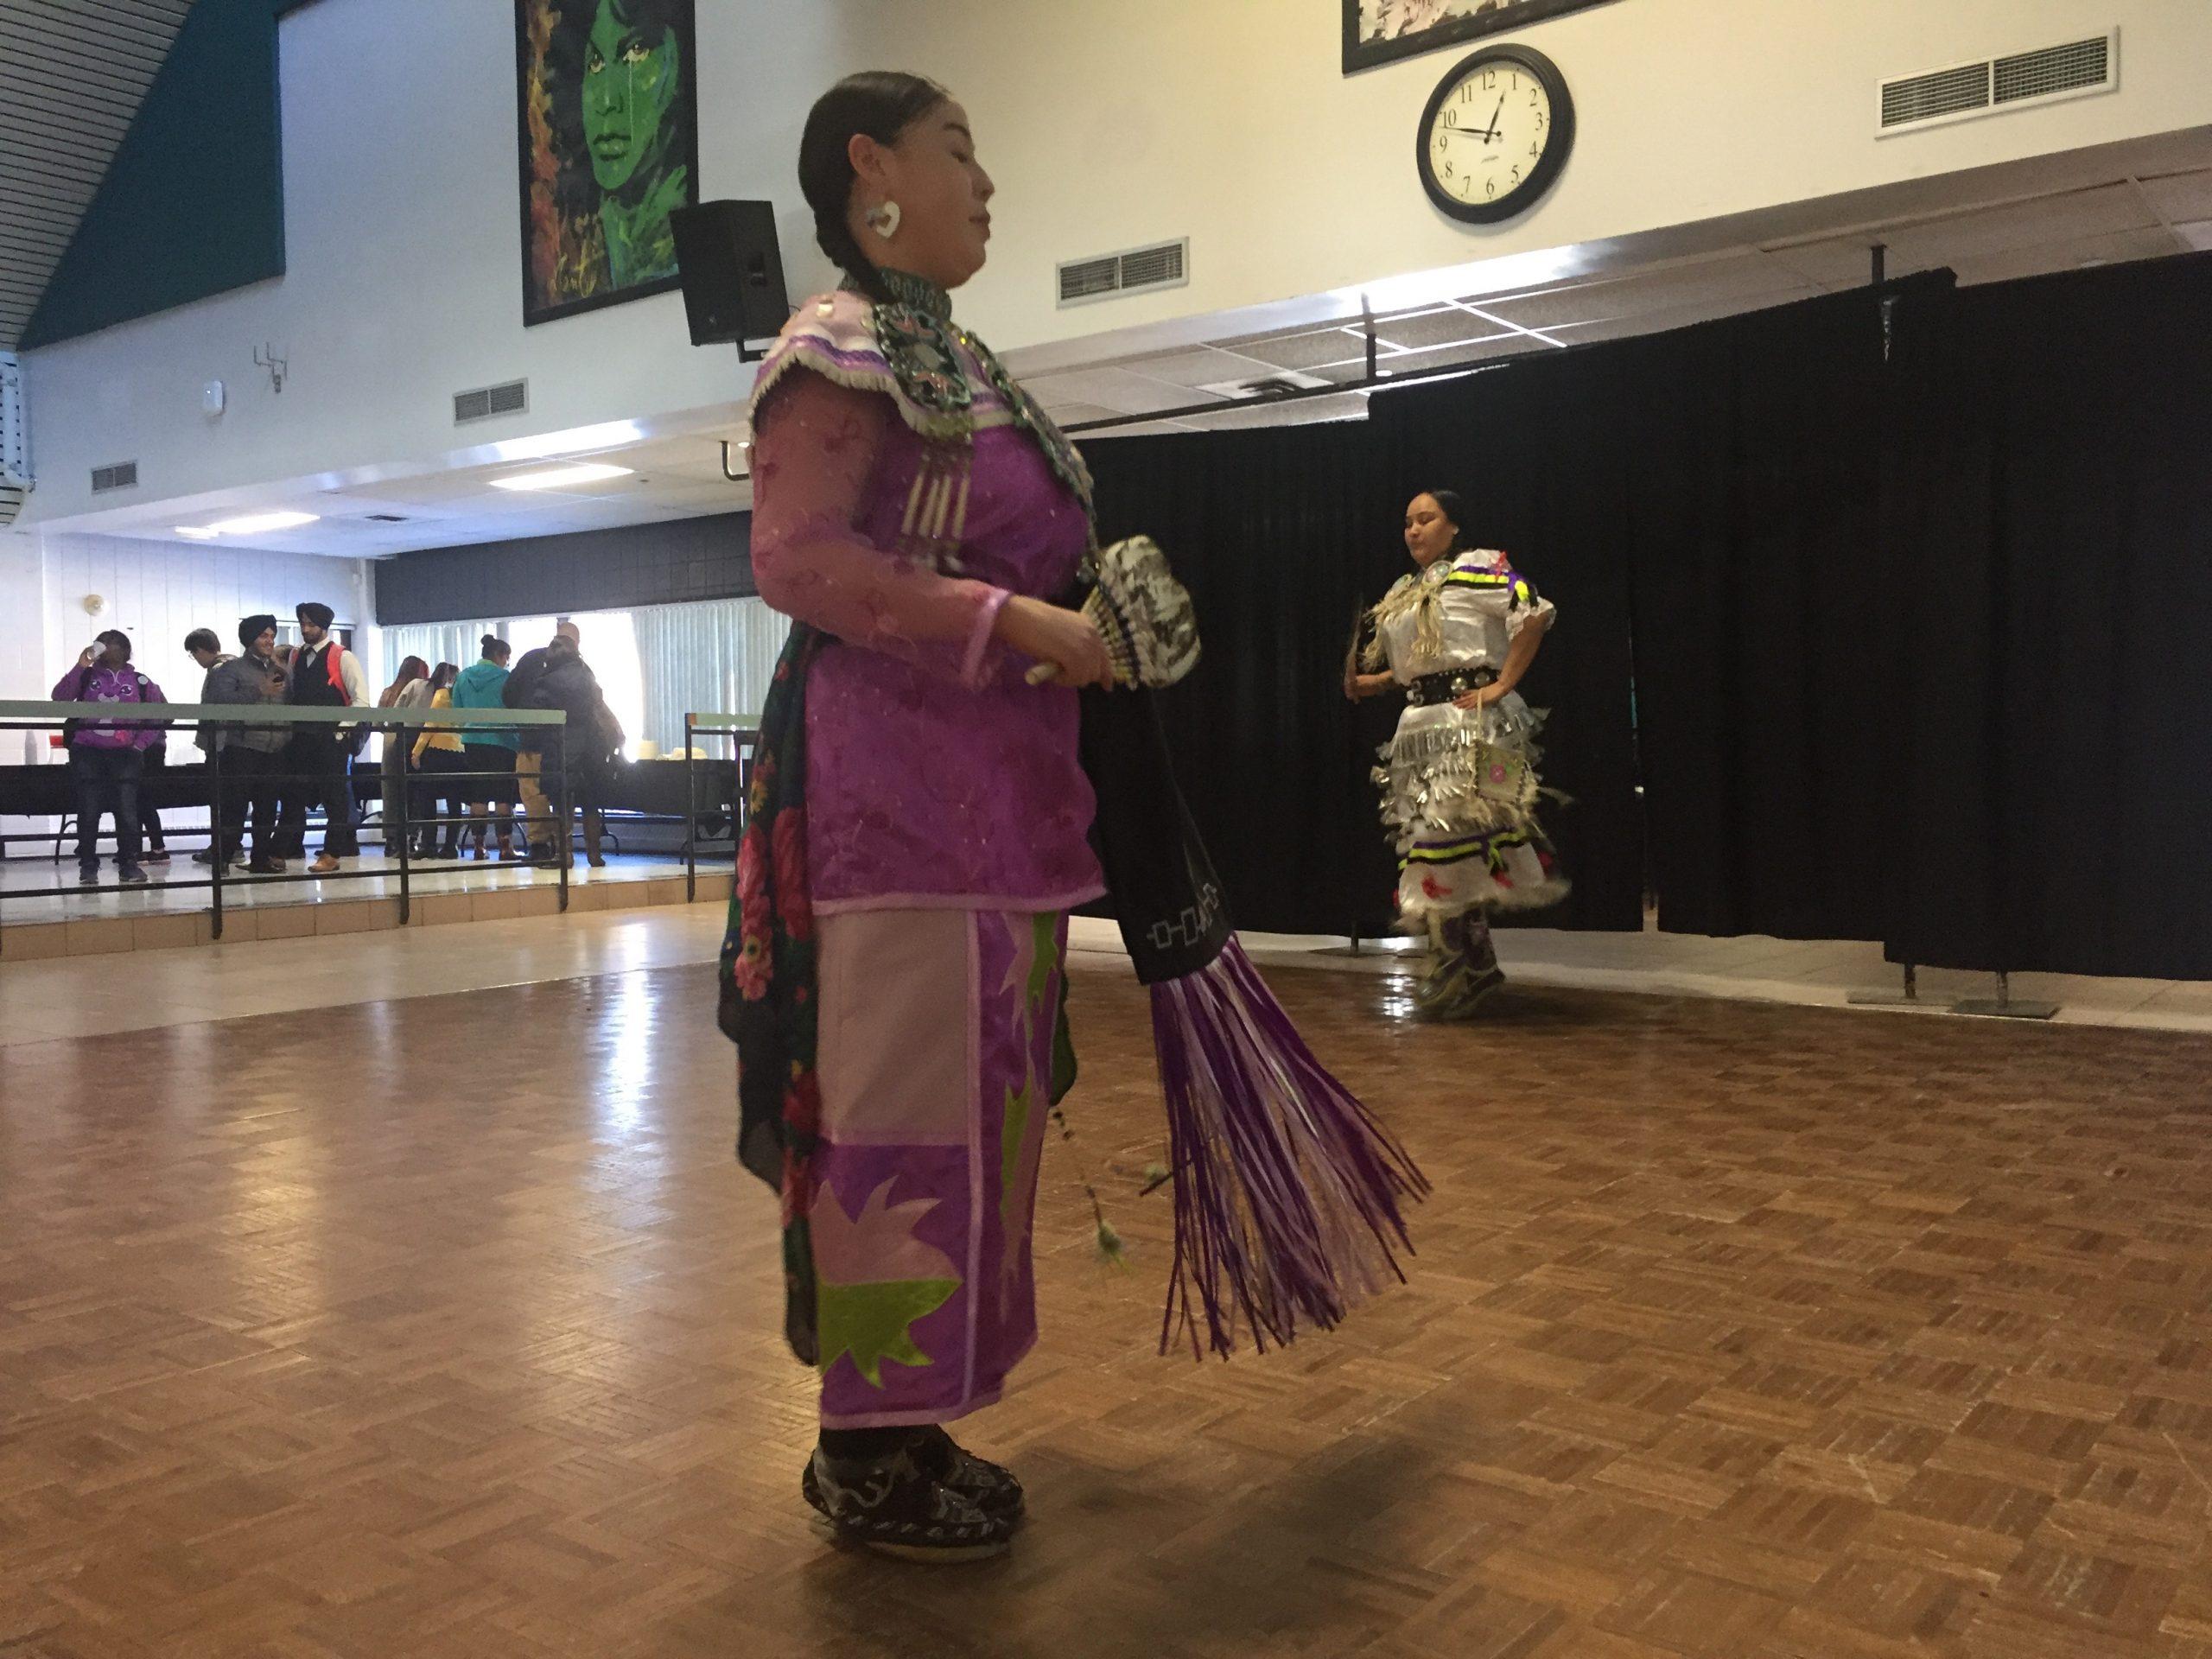 Celebrating cultural diversity at Fanshawe